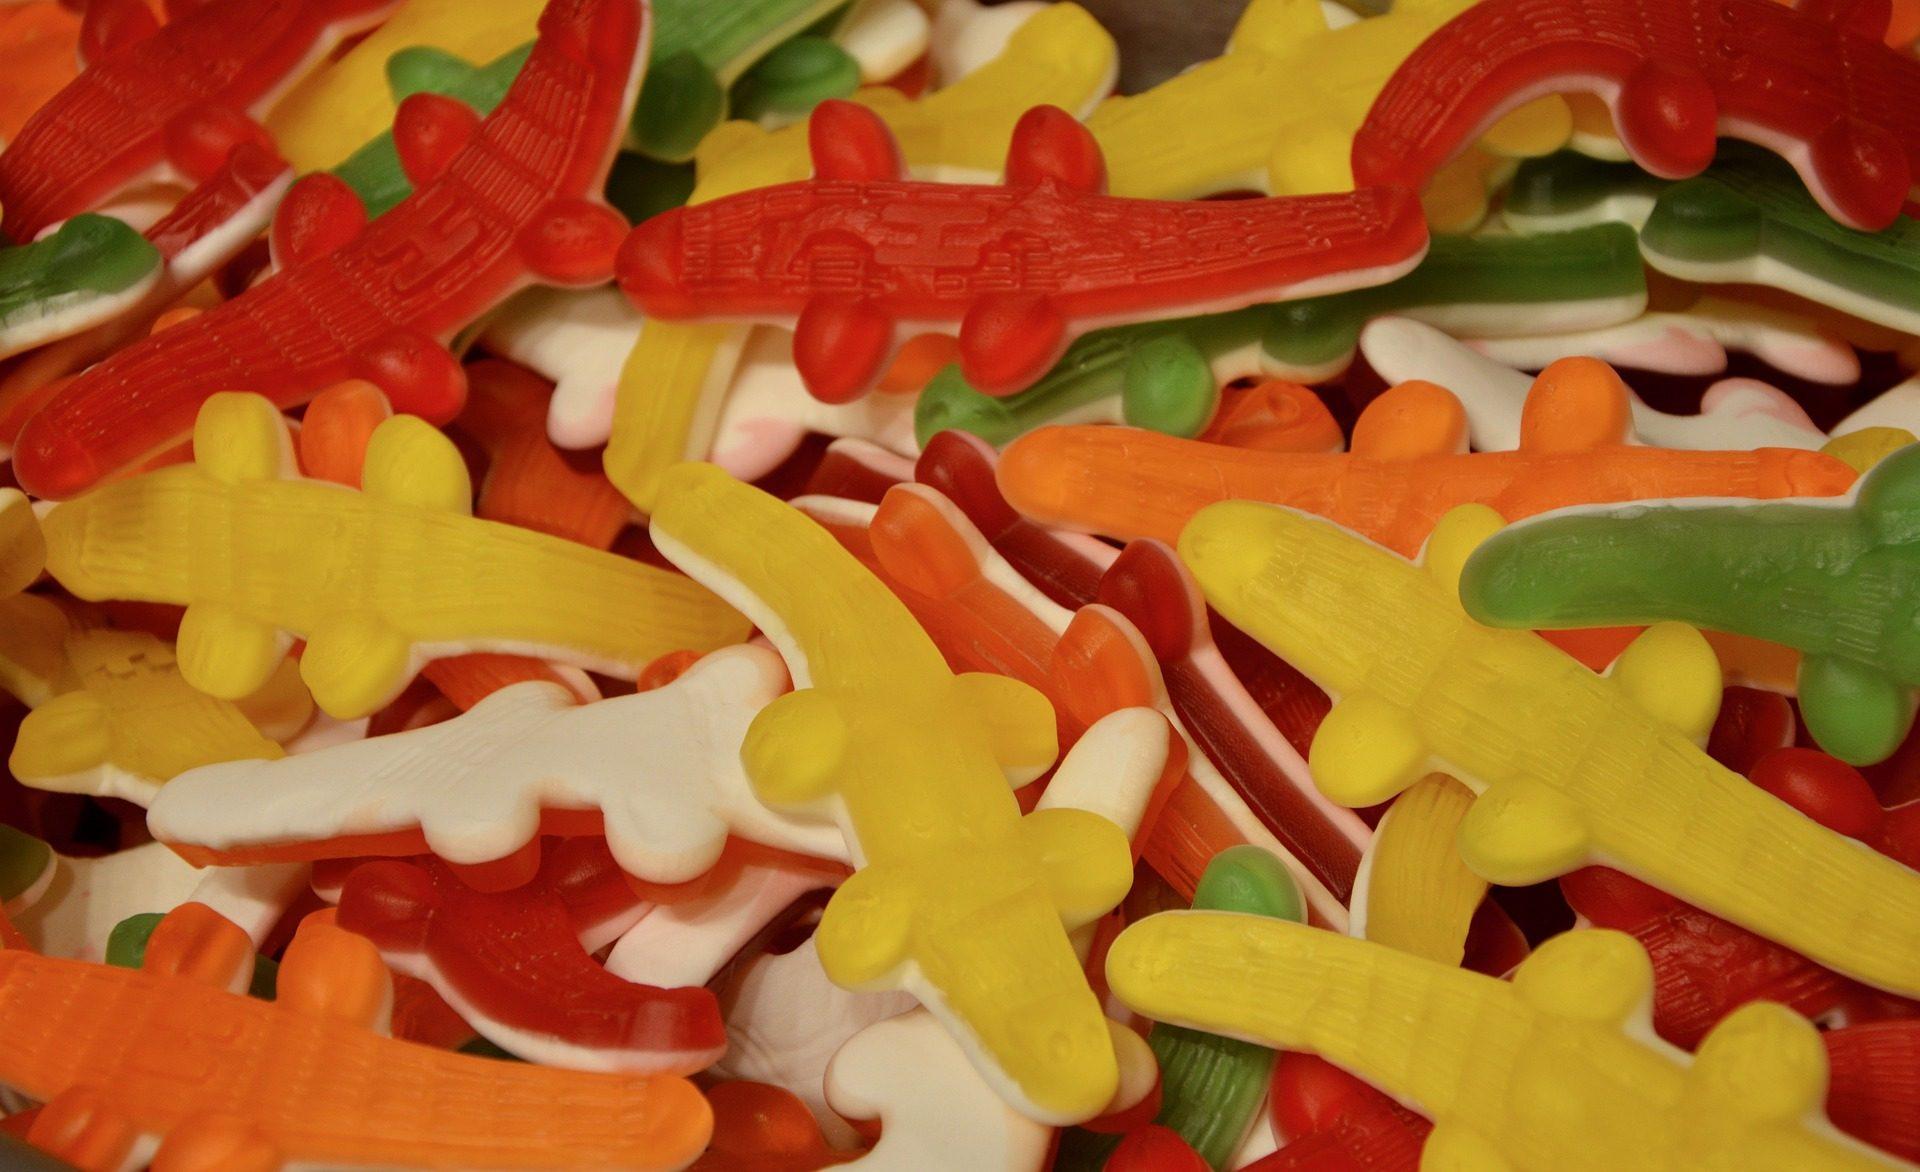 gominolas, 小玩意, 软糖, 鳄鱼, 甜, 多彩 - 高清壁纸 - 教授-falken.com